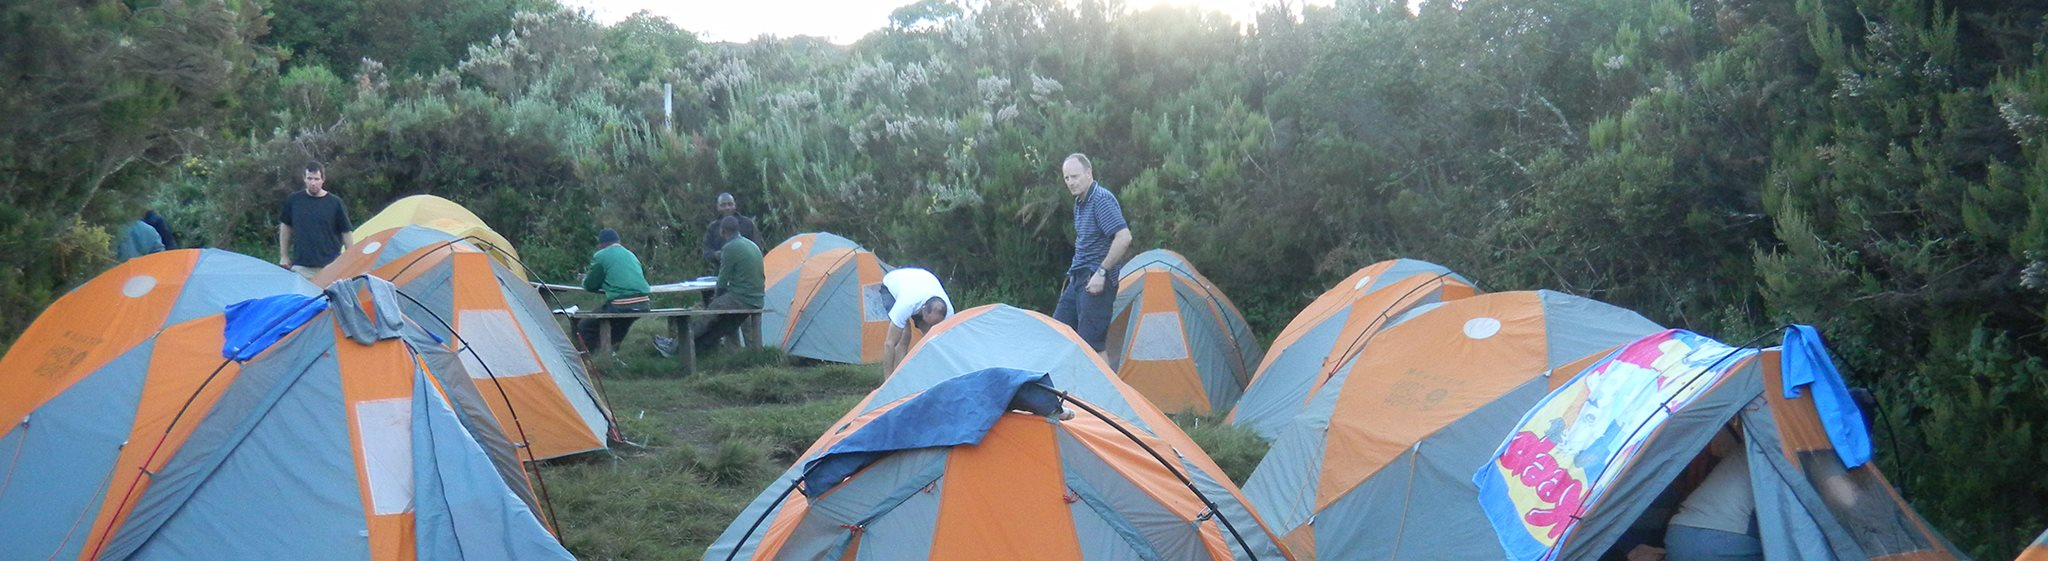 Kilimanjaro + Zanzibar via Rongai Route - Safanta Tours & Travel Company Limited